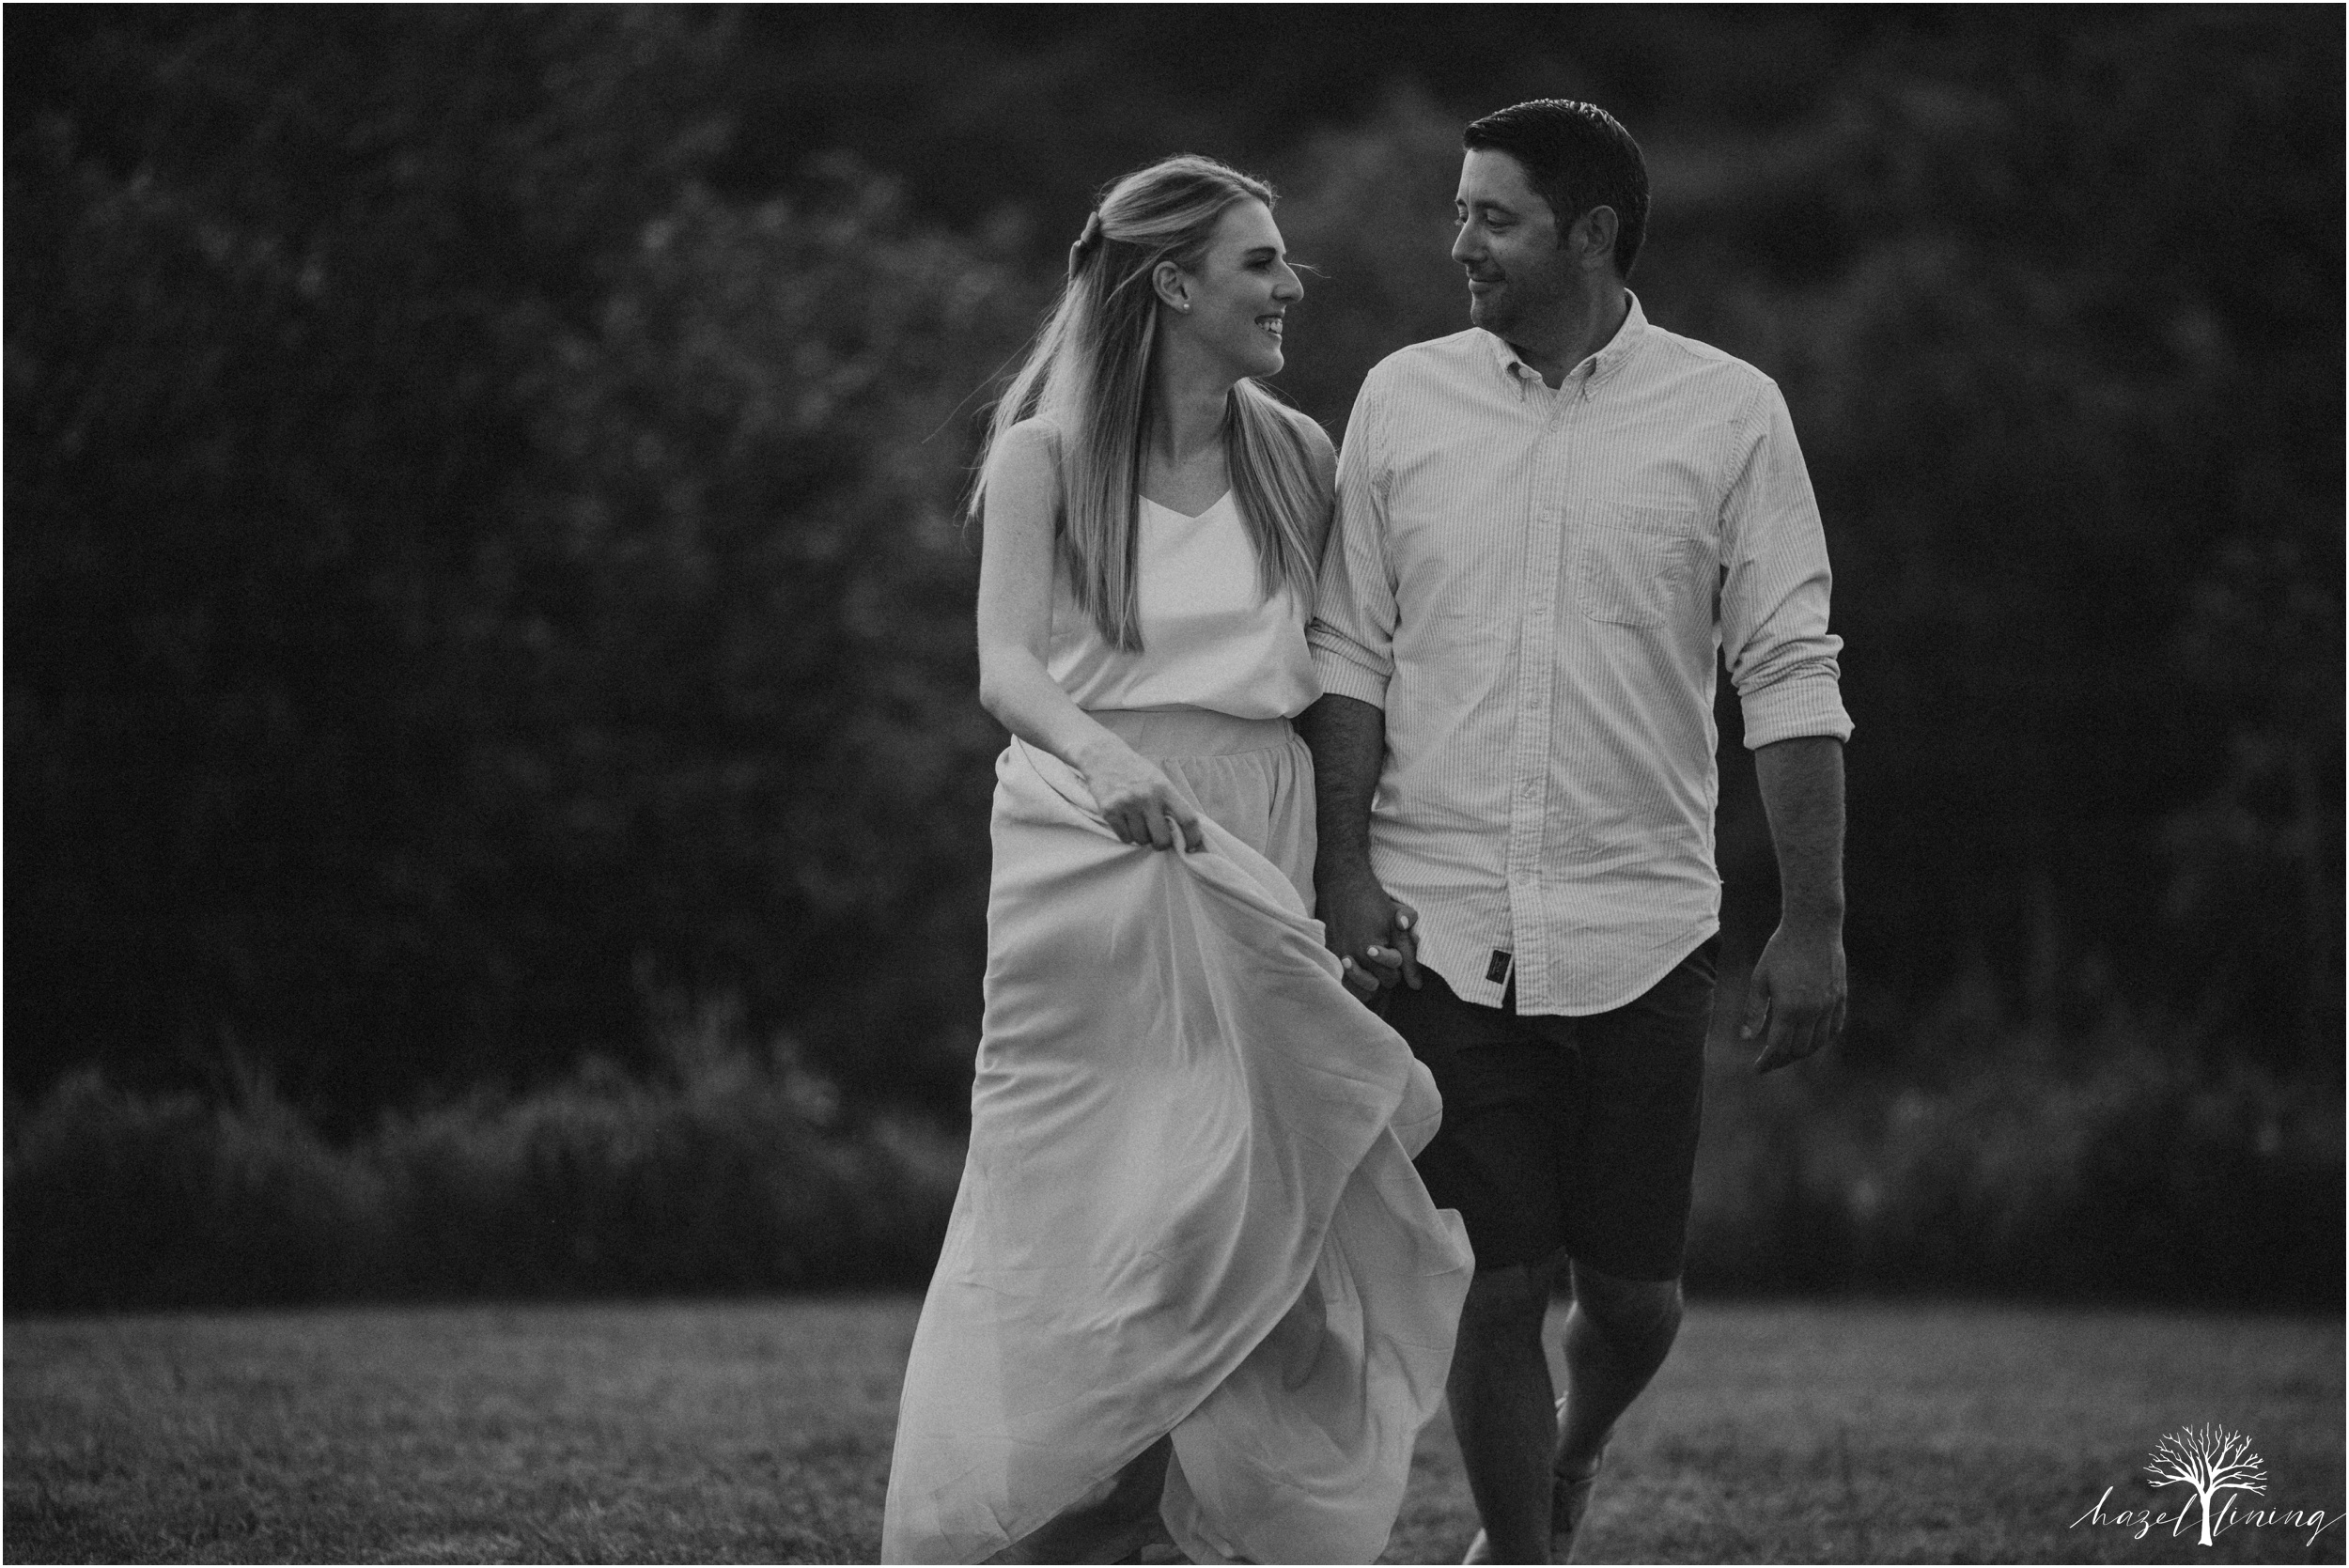 ashley-fillmore-steve-reimer-trexler-nature-preserve-summer-engagement-session-schnecksville-pennsylvania-hazel-lining-photography-destination-elopement-wedding-engagement-photography_0057.jpg